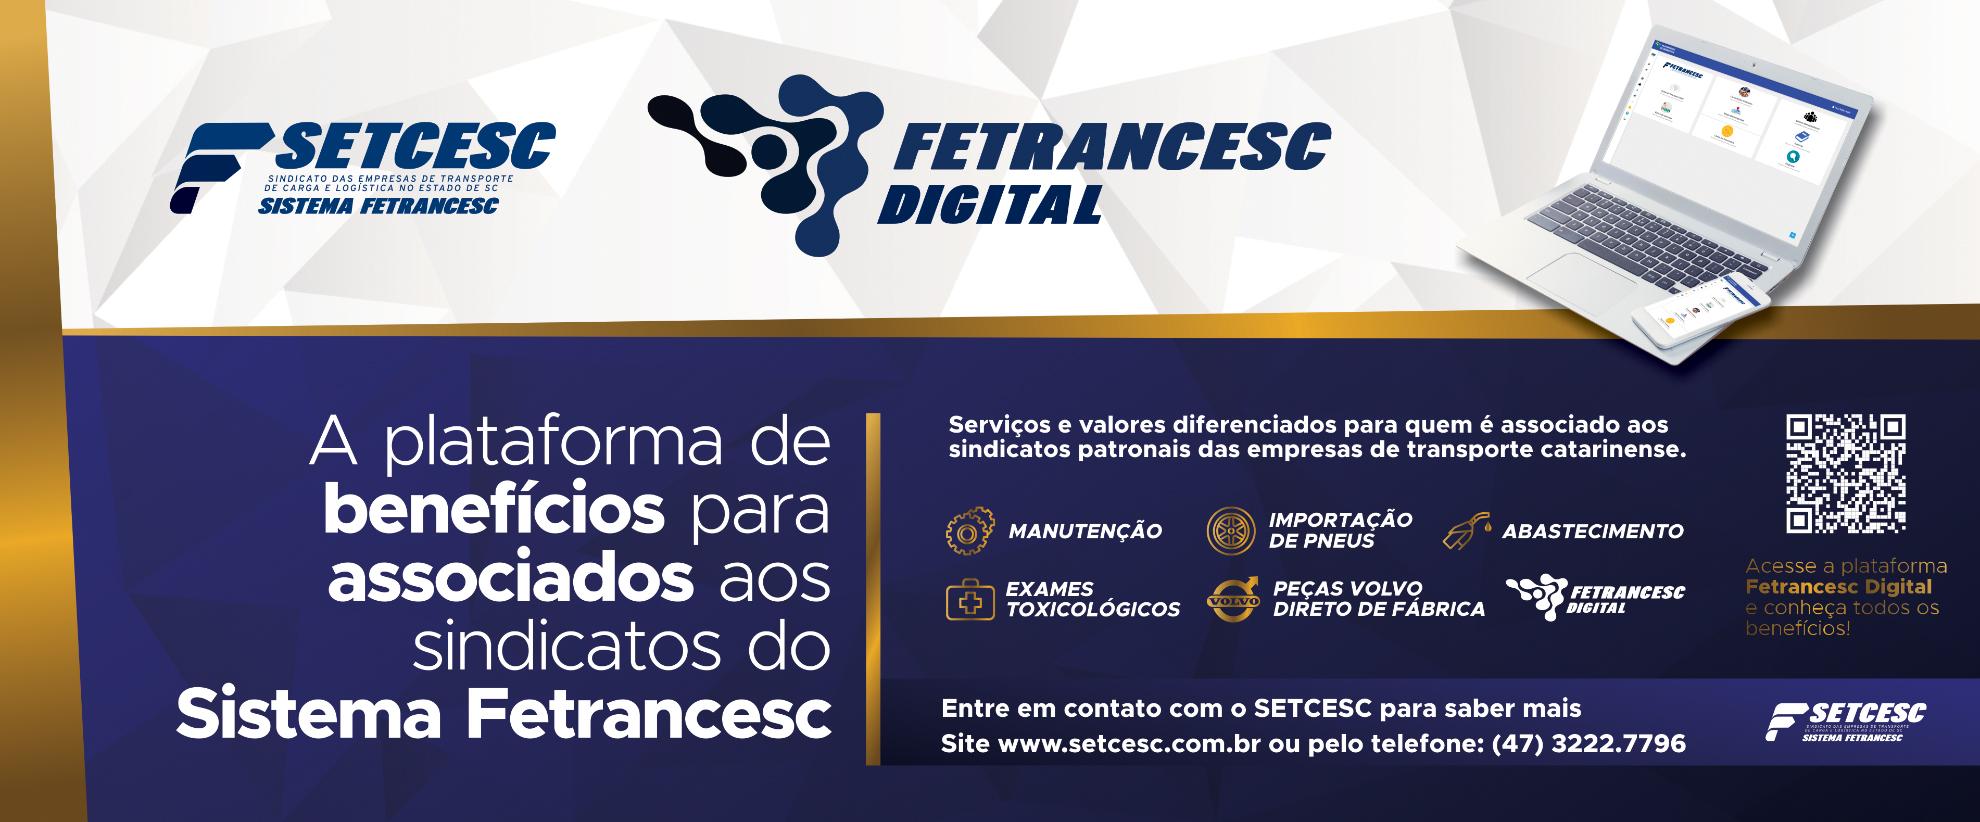 https://setcesc.sindicatosdigitais.com.br/clube_sindicato